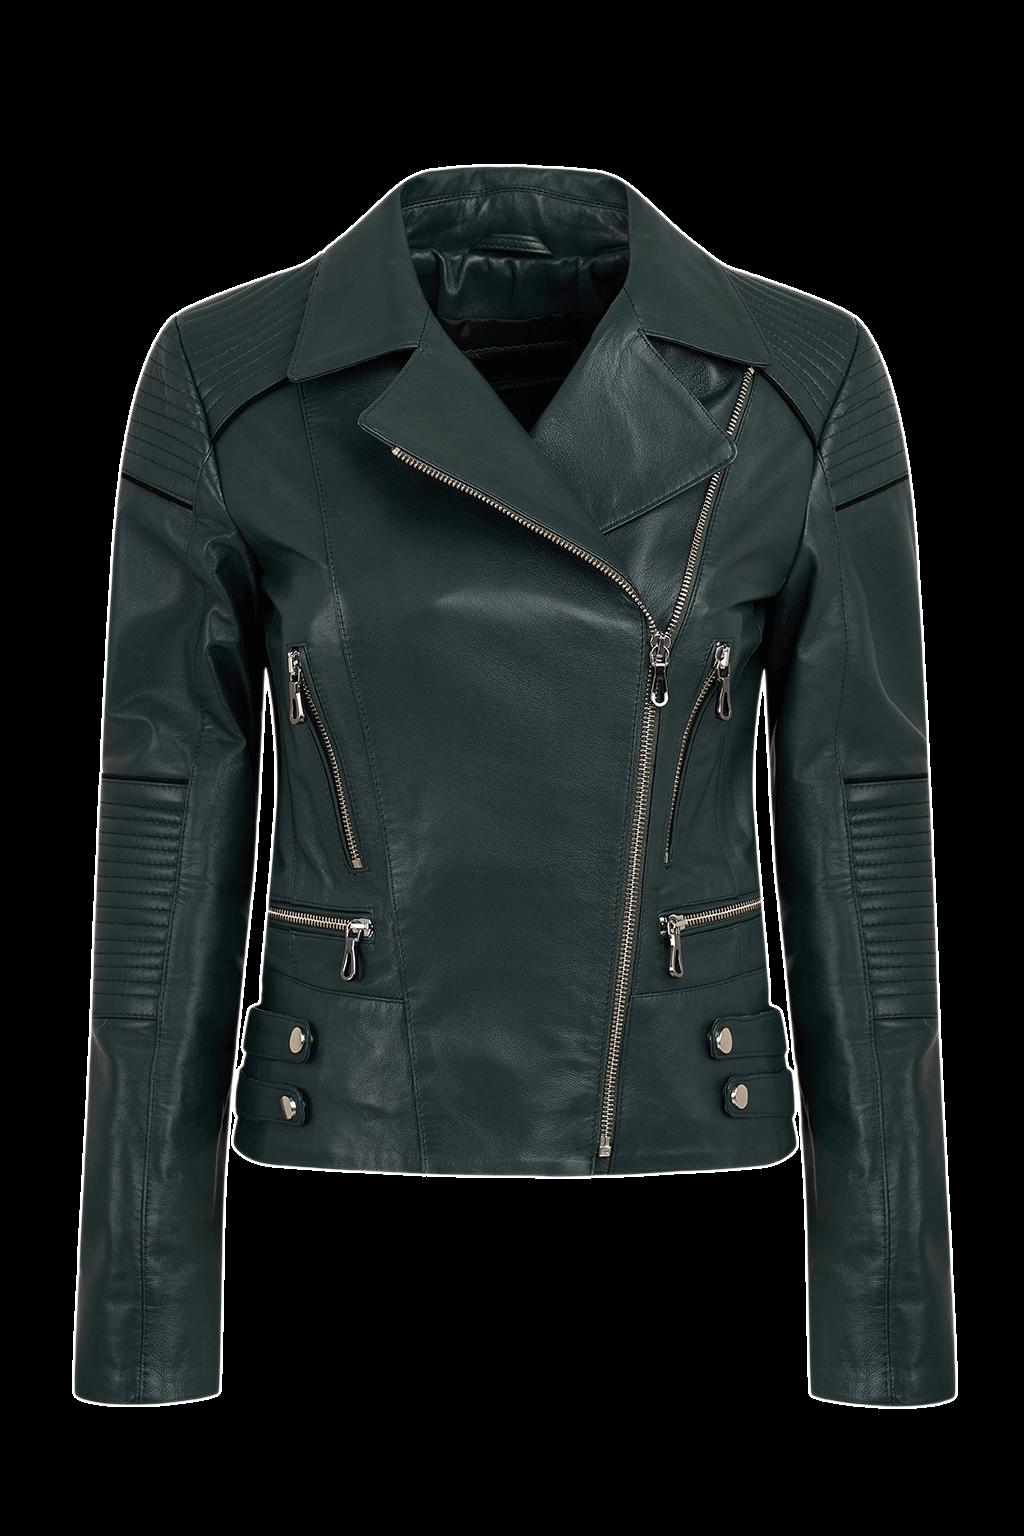 Women's Leather Motorcycle Jacket - Dark Green